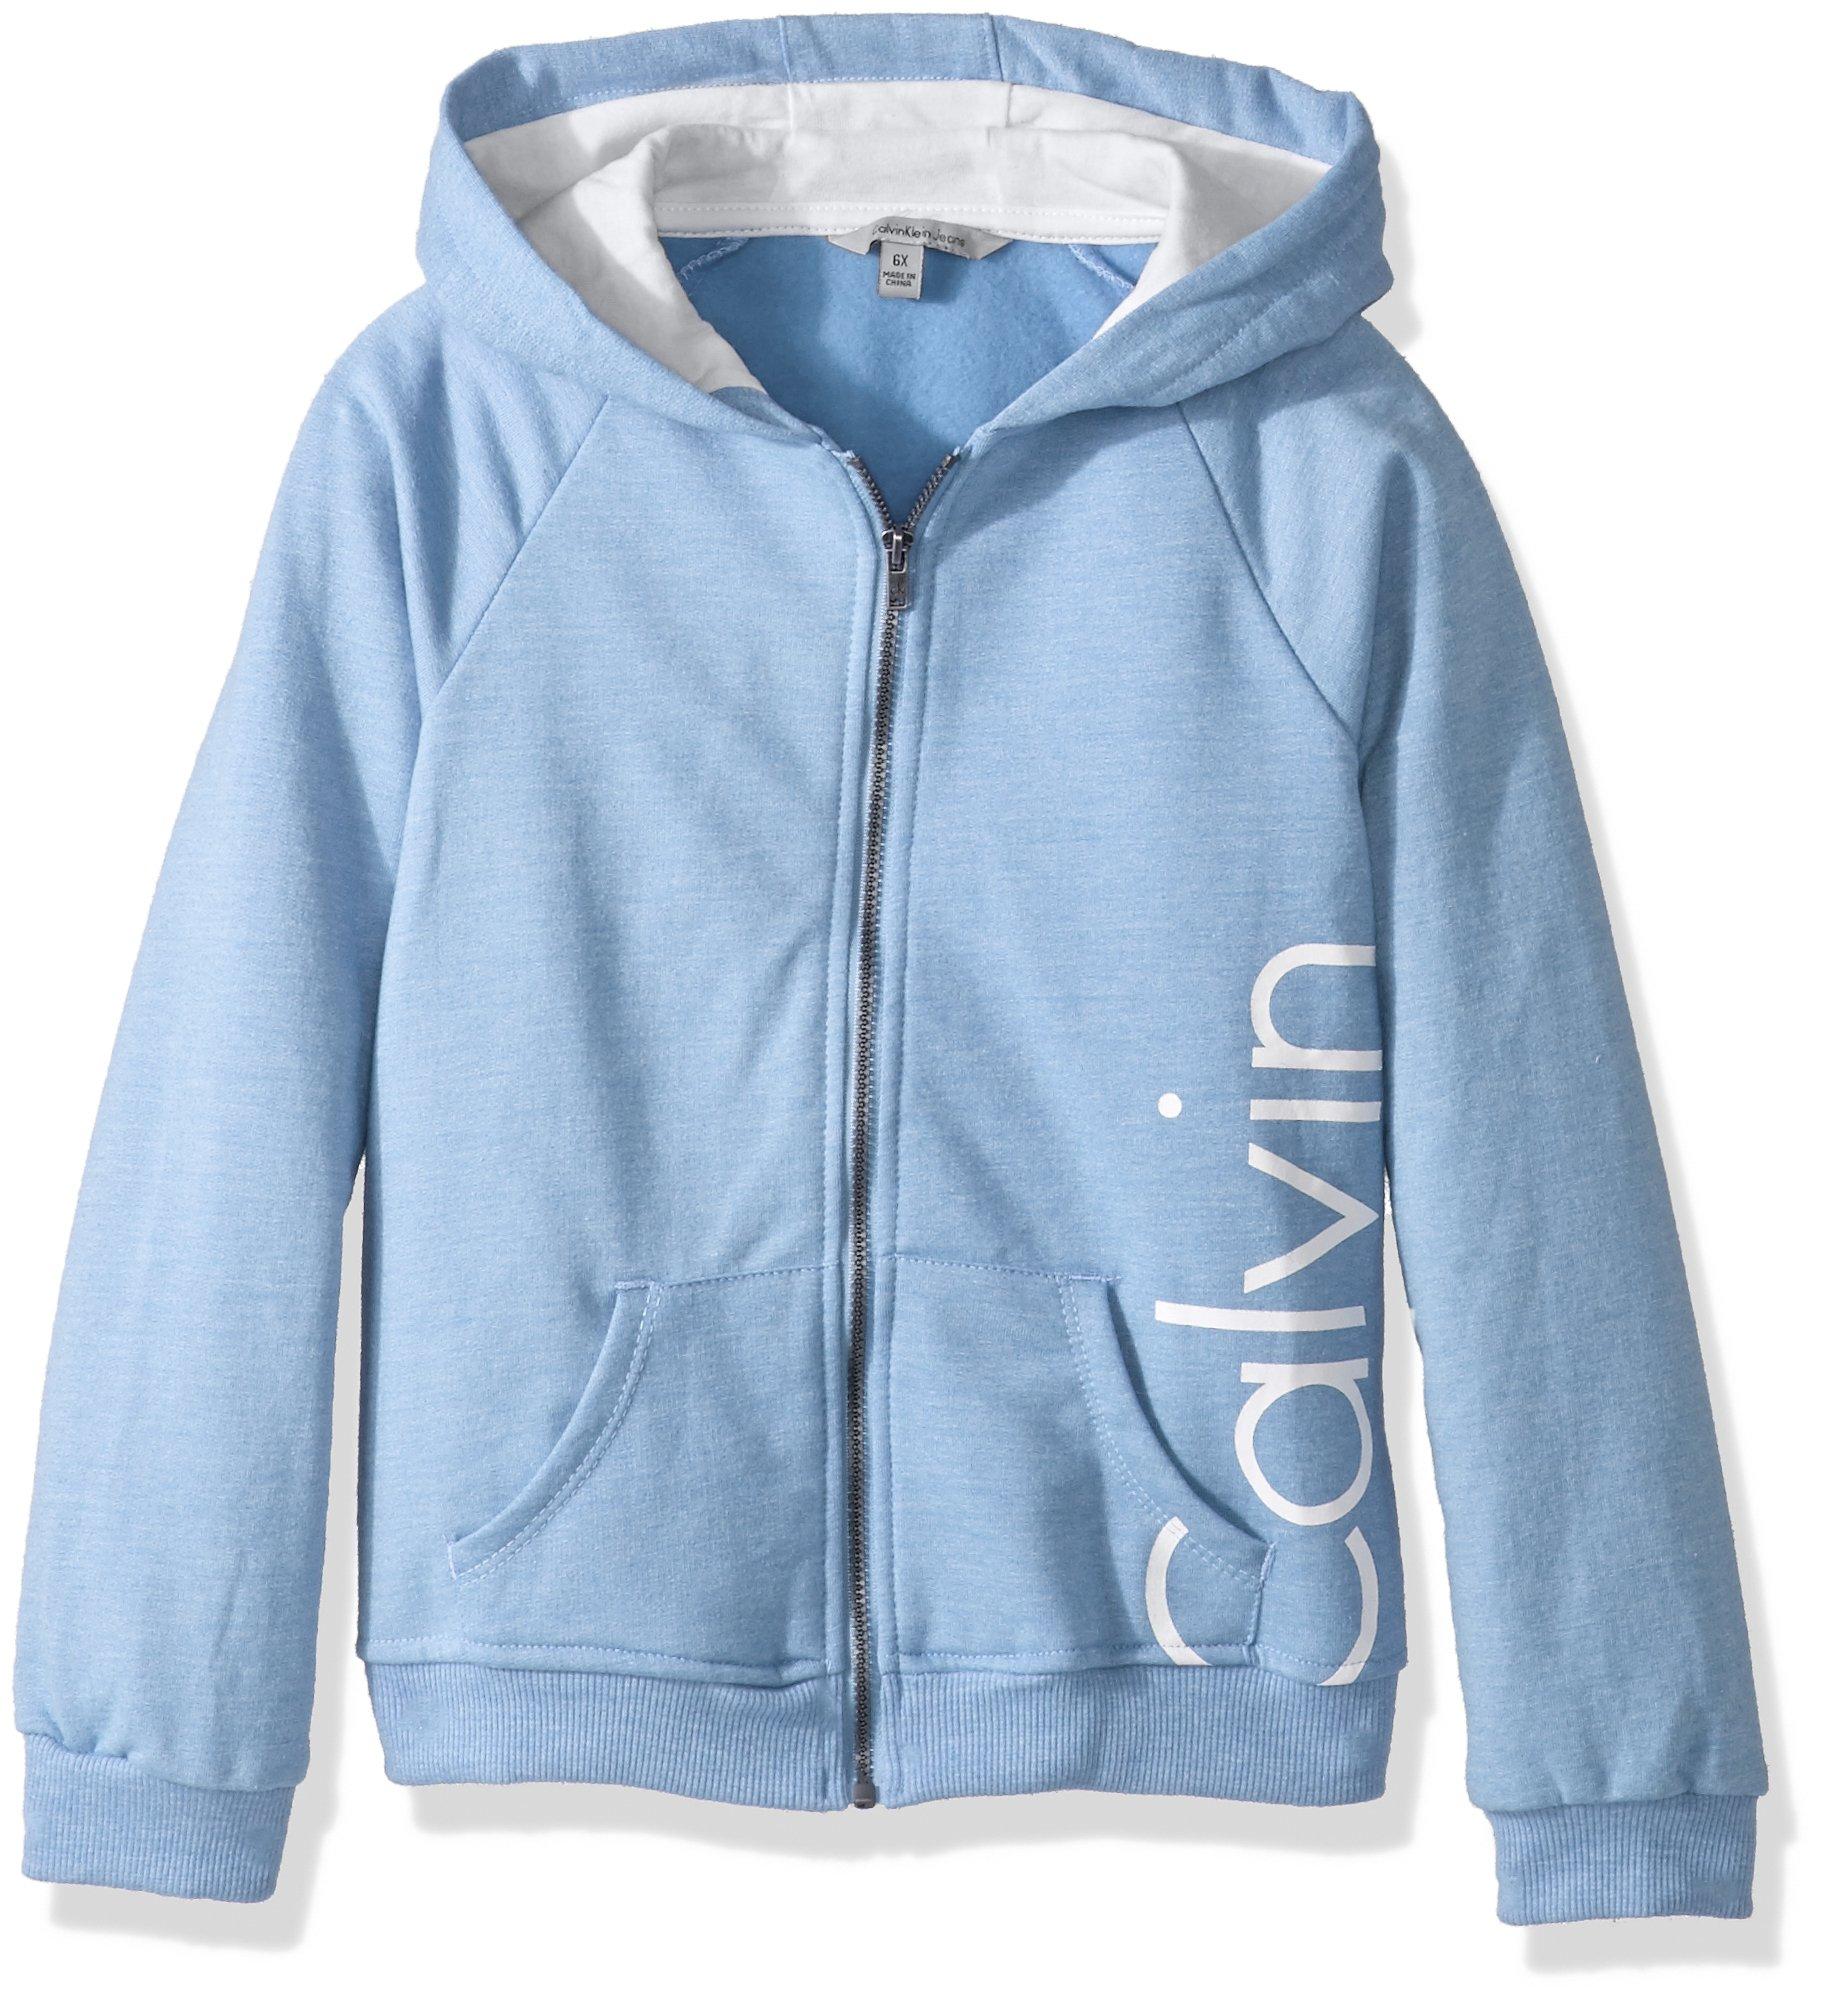 Calvin Klein Toddler Girls' Logo Zip Front Hoodie, Periwinkle, 4T